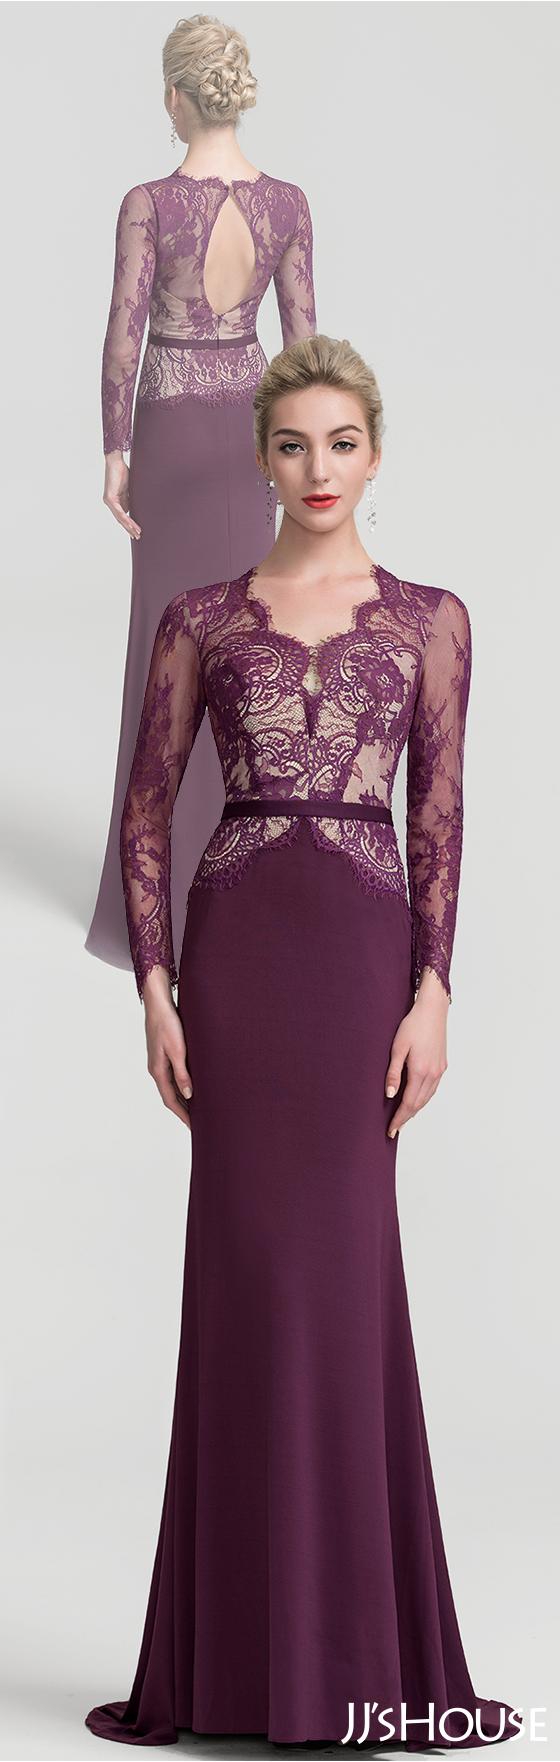 JJsHouse #Evening | JJsHouse Party Dresses -Evening/Cocktail ...